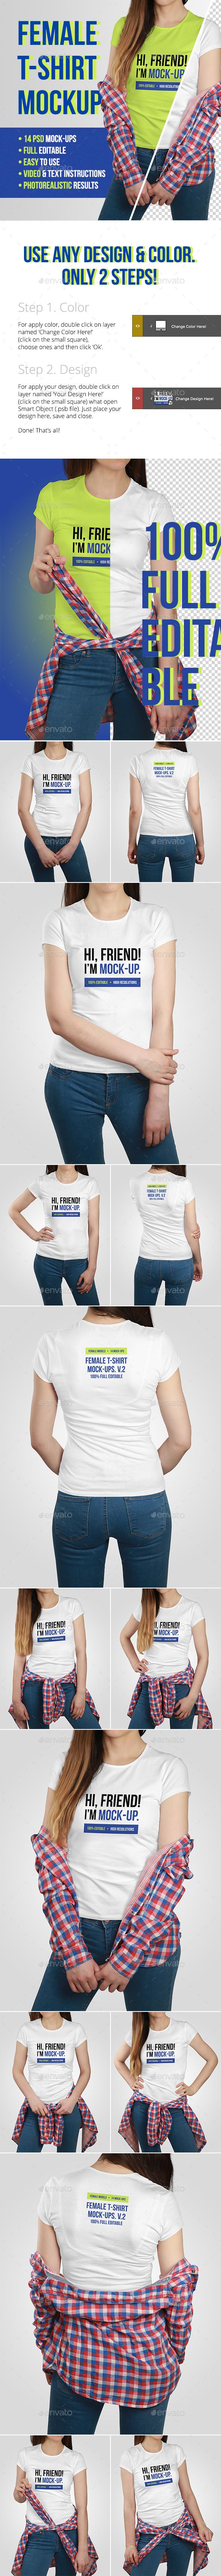 Female T-Shirt Mockups Vol.2 - T-shirts Apparel